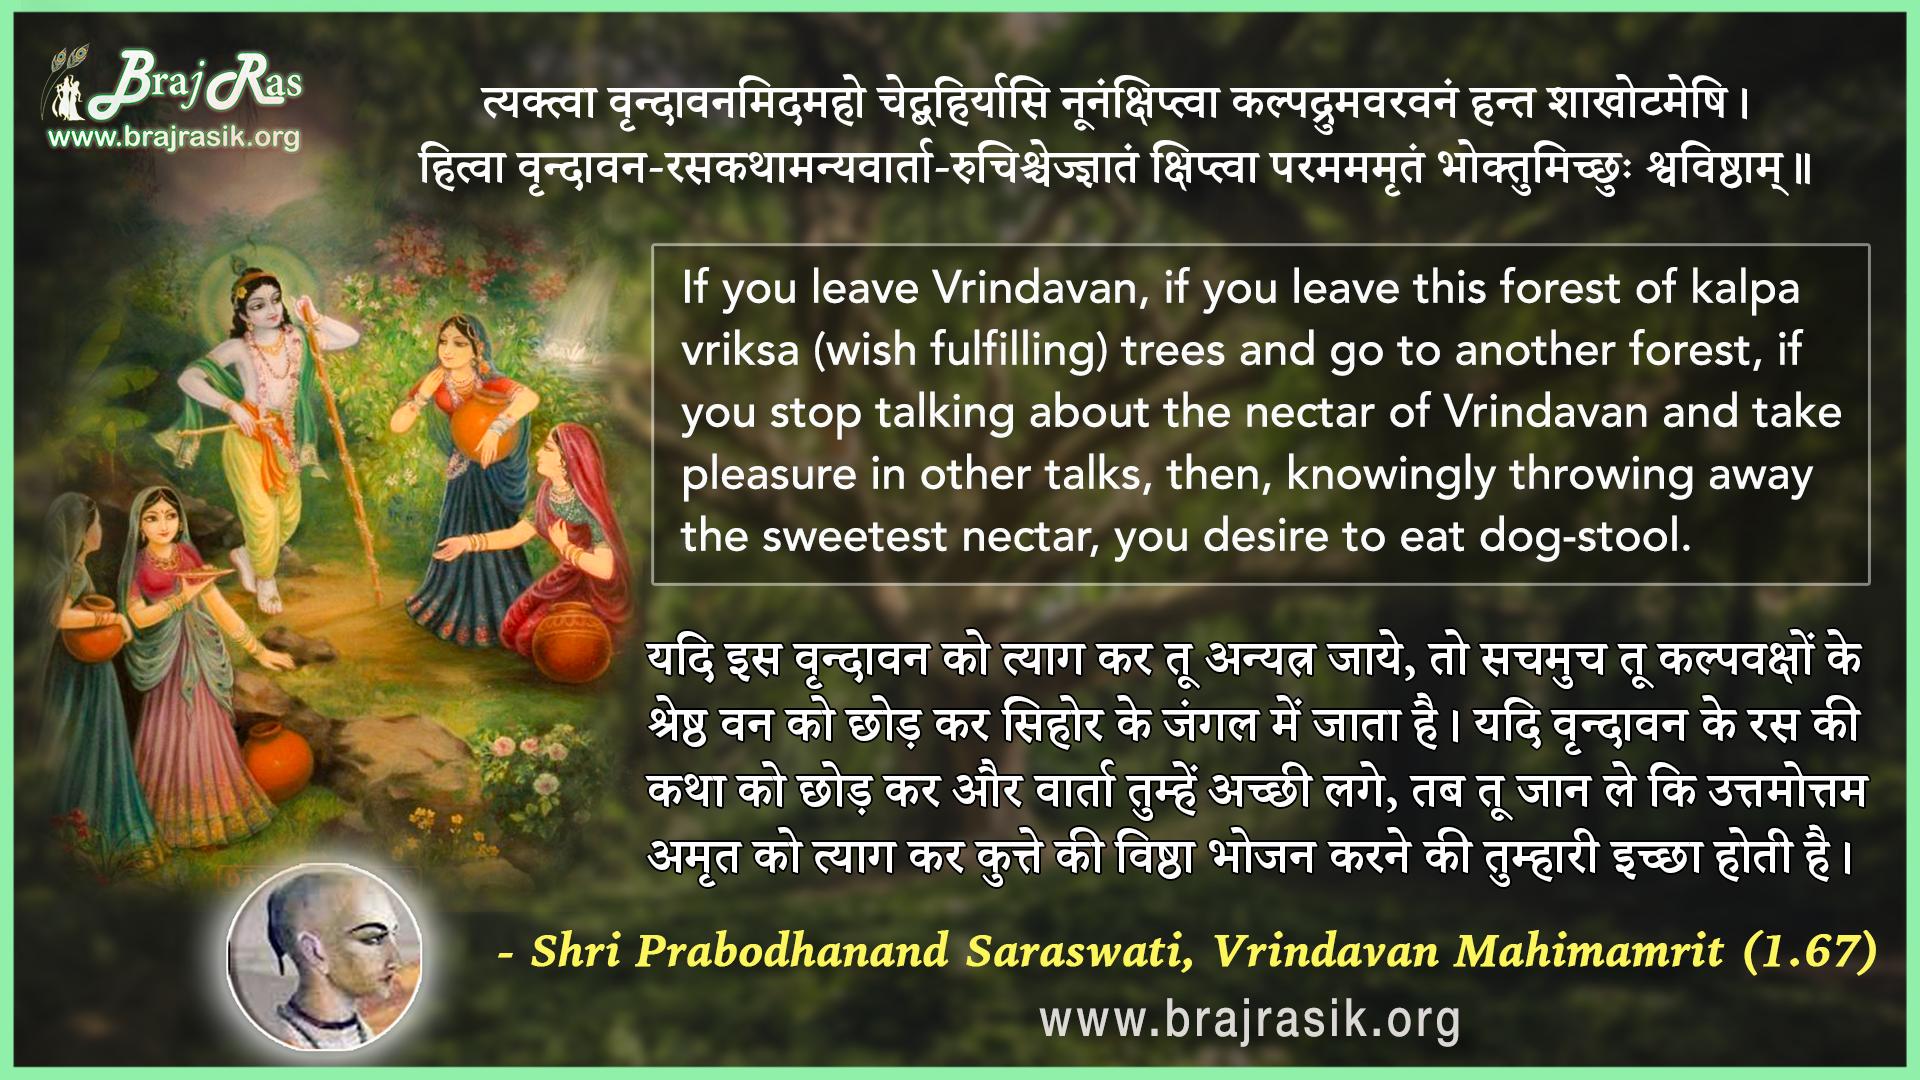 Tyaktva Vrindavanamidamaho Chedbahiryaasi  - Shri Prabodhanand Saraswati, Vrindavan Mahimamrit (1.67)